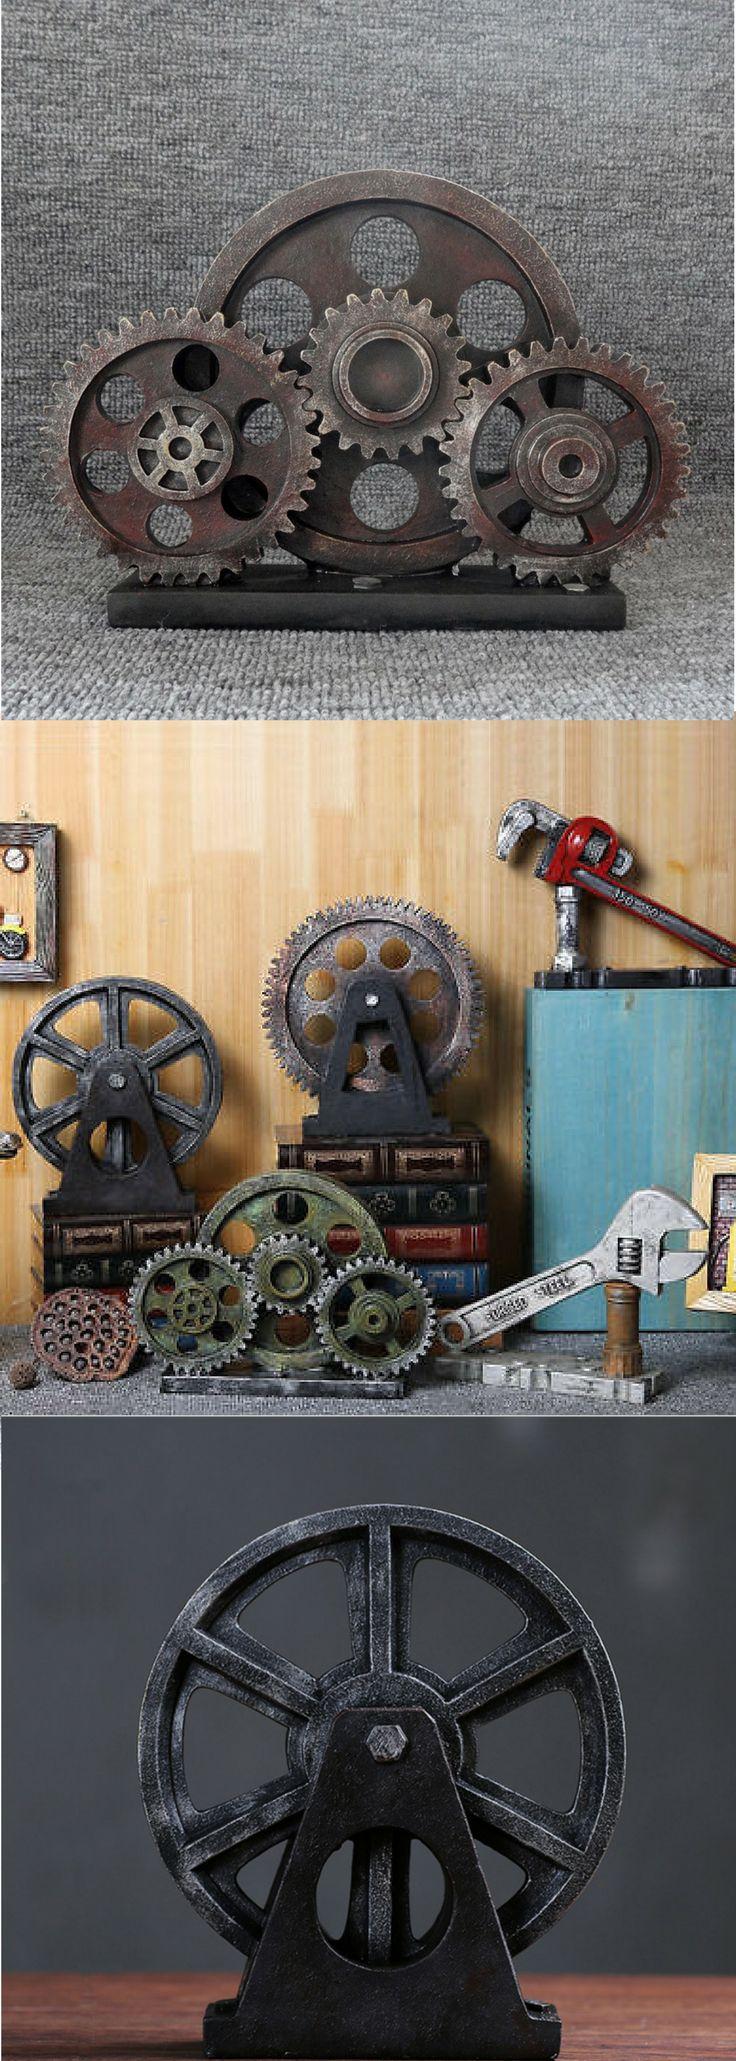 Industrial Steampunk Gear, Driving Wheel, Train, Spanner, Pipe Wrench Model/Figurine Decor